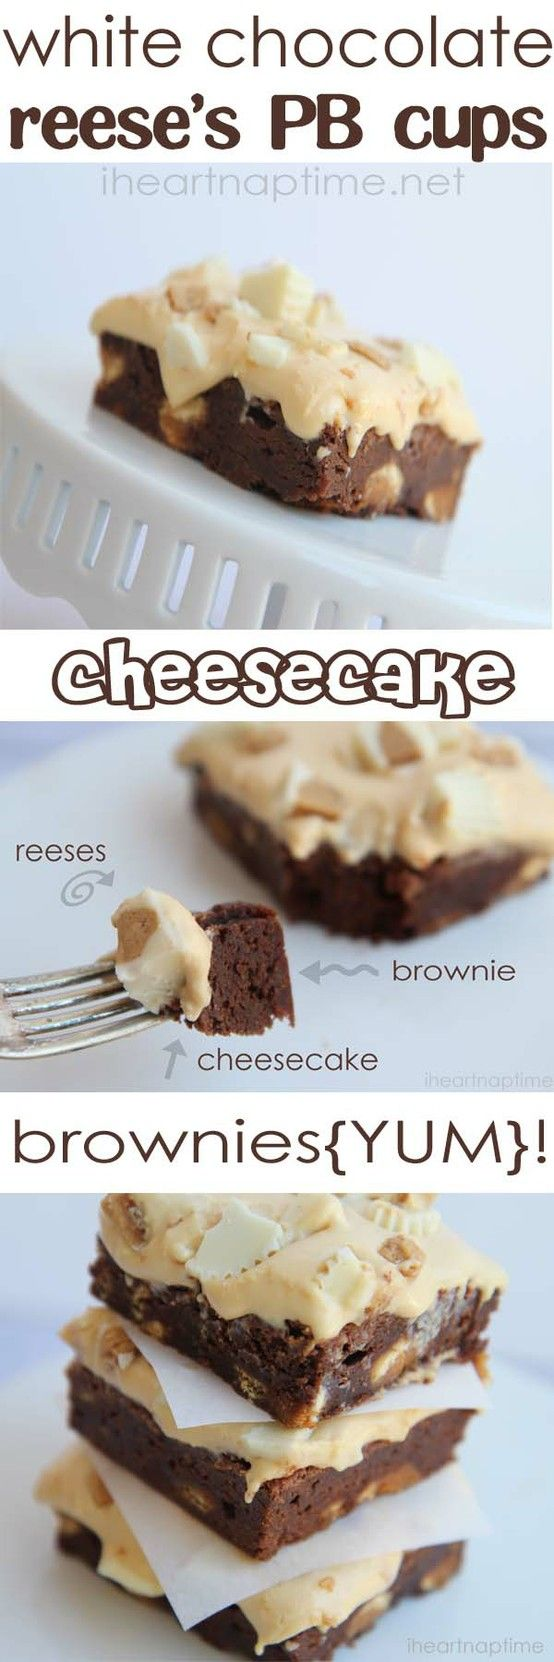 how to make box brownies cake like